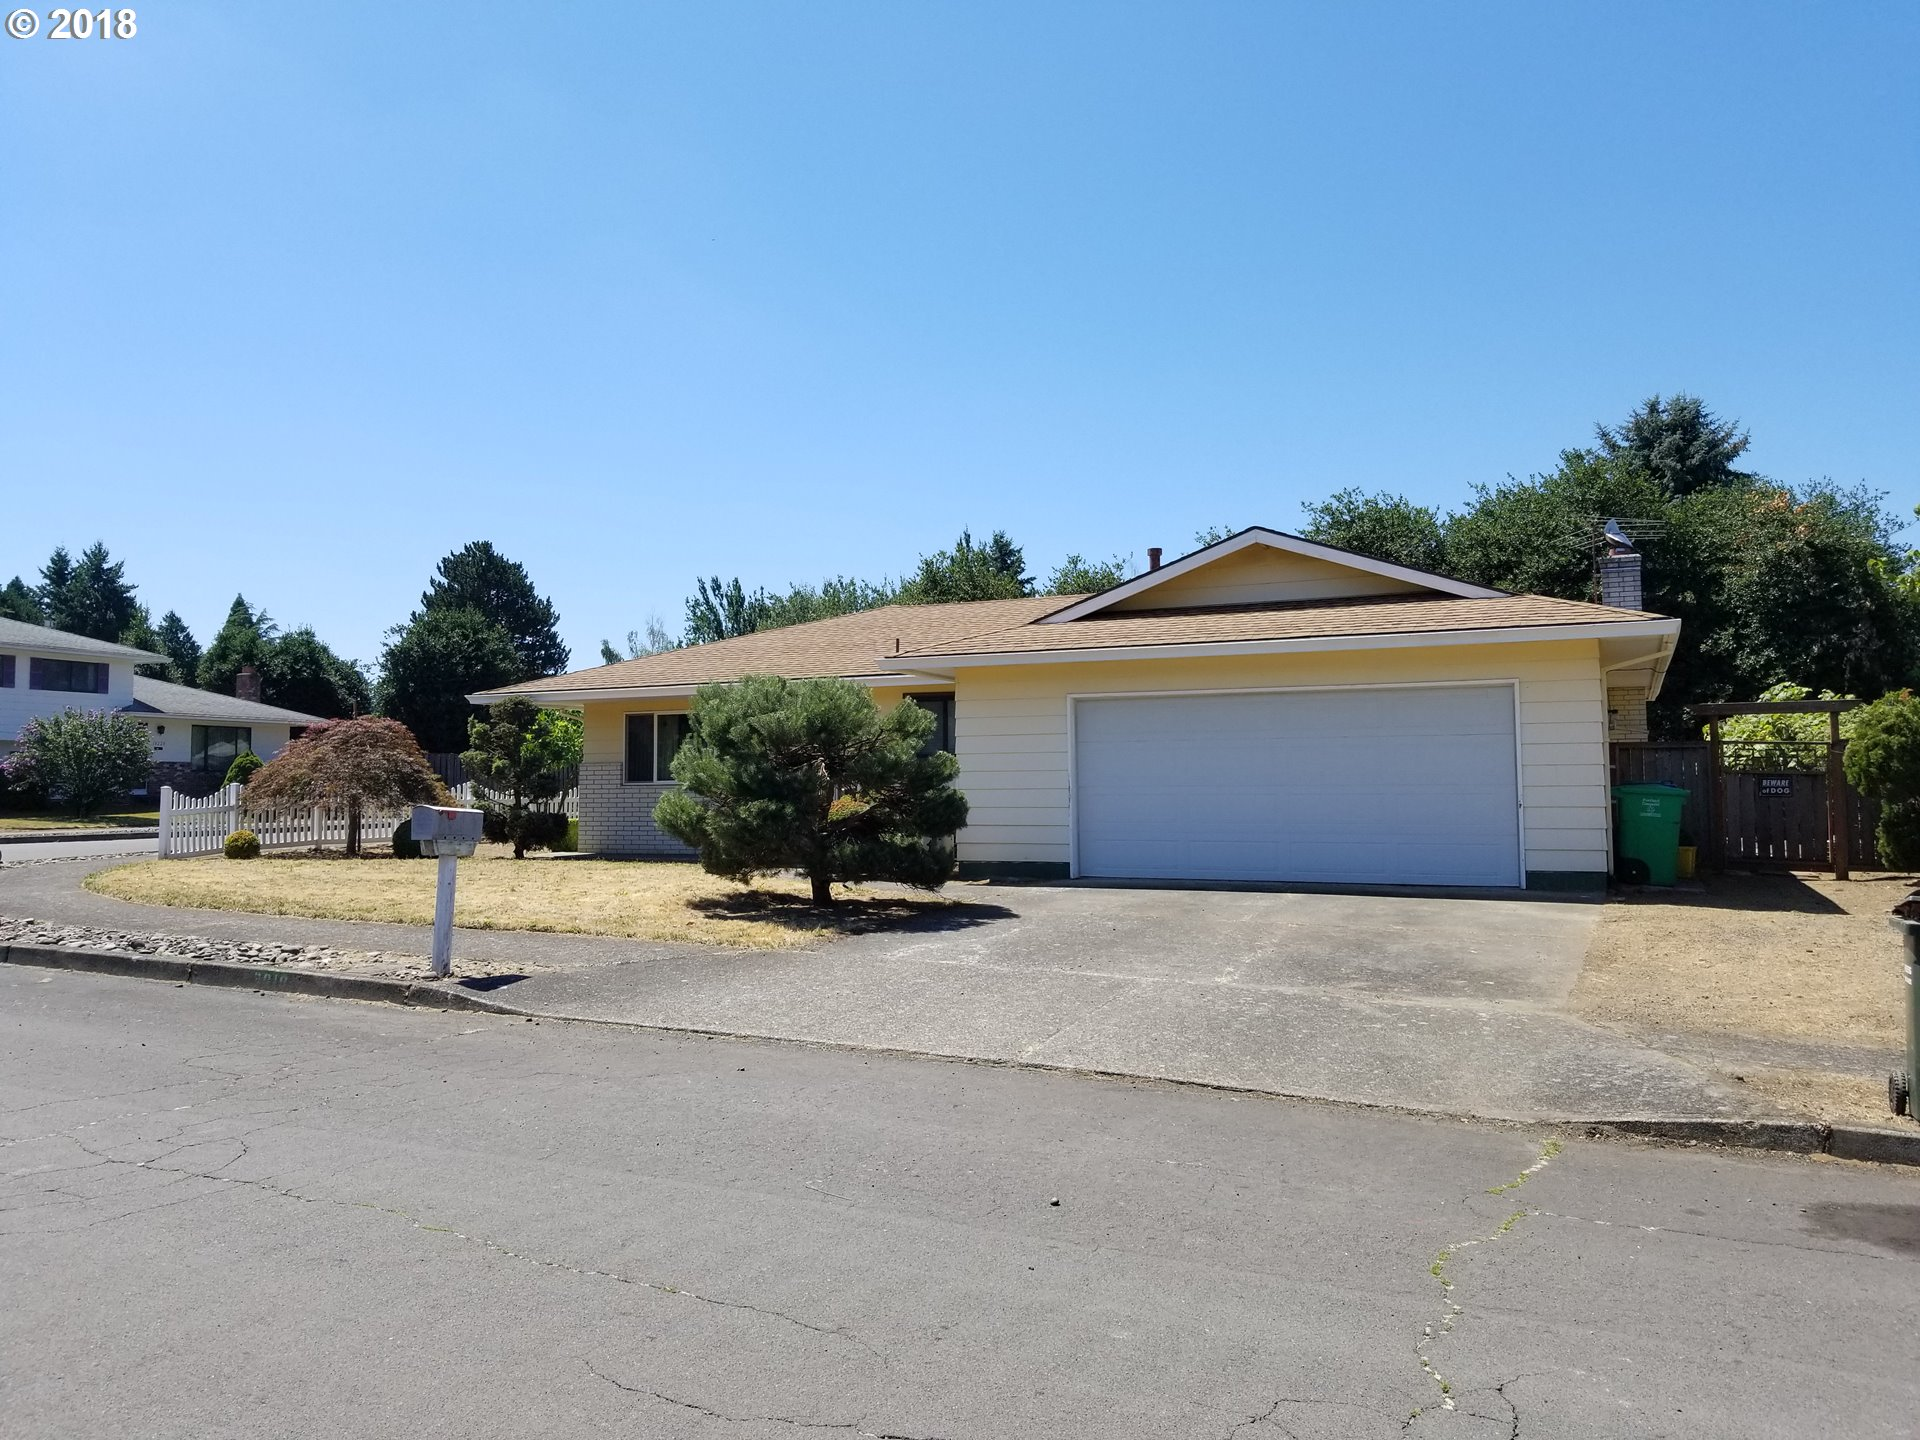 3919 NE 143RD AVE Portland, OR 97230 - MLS #: 18689156